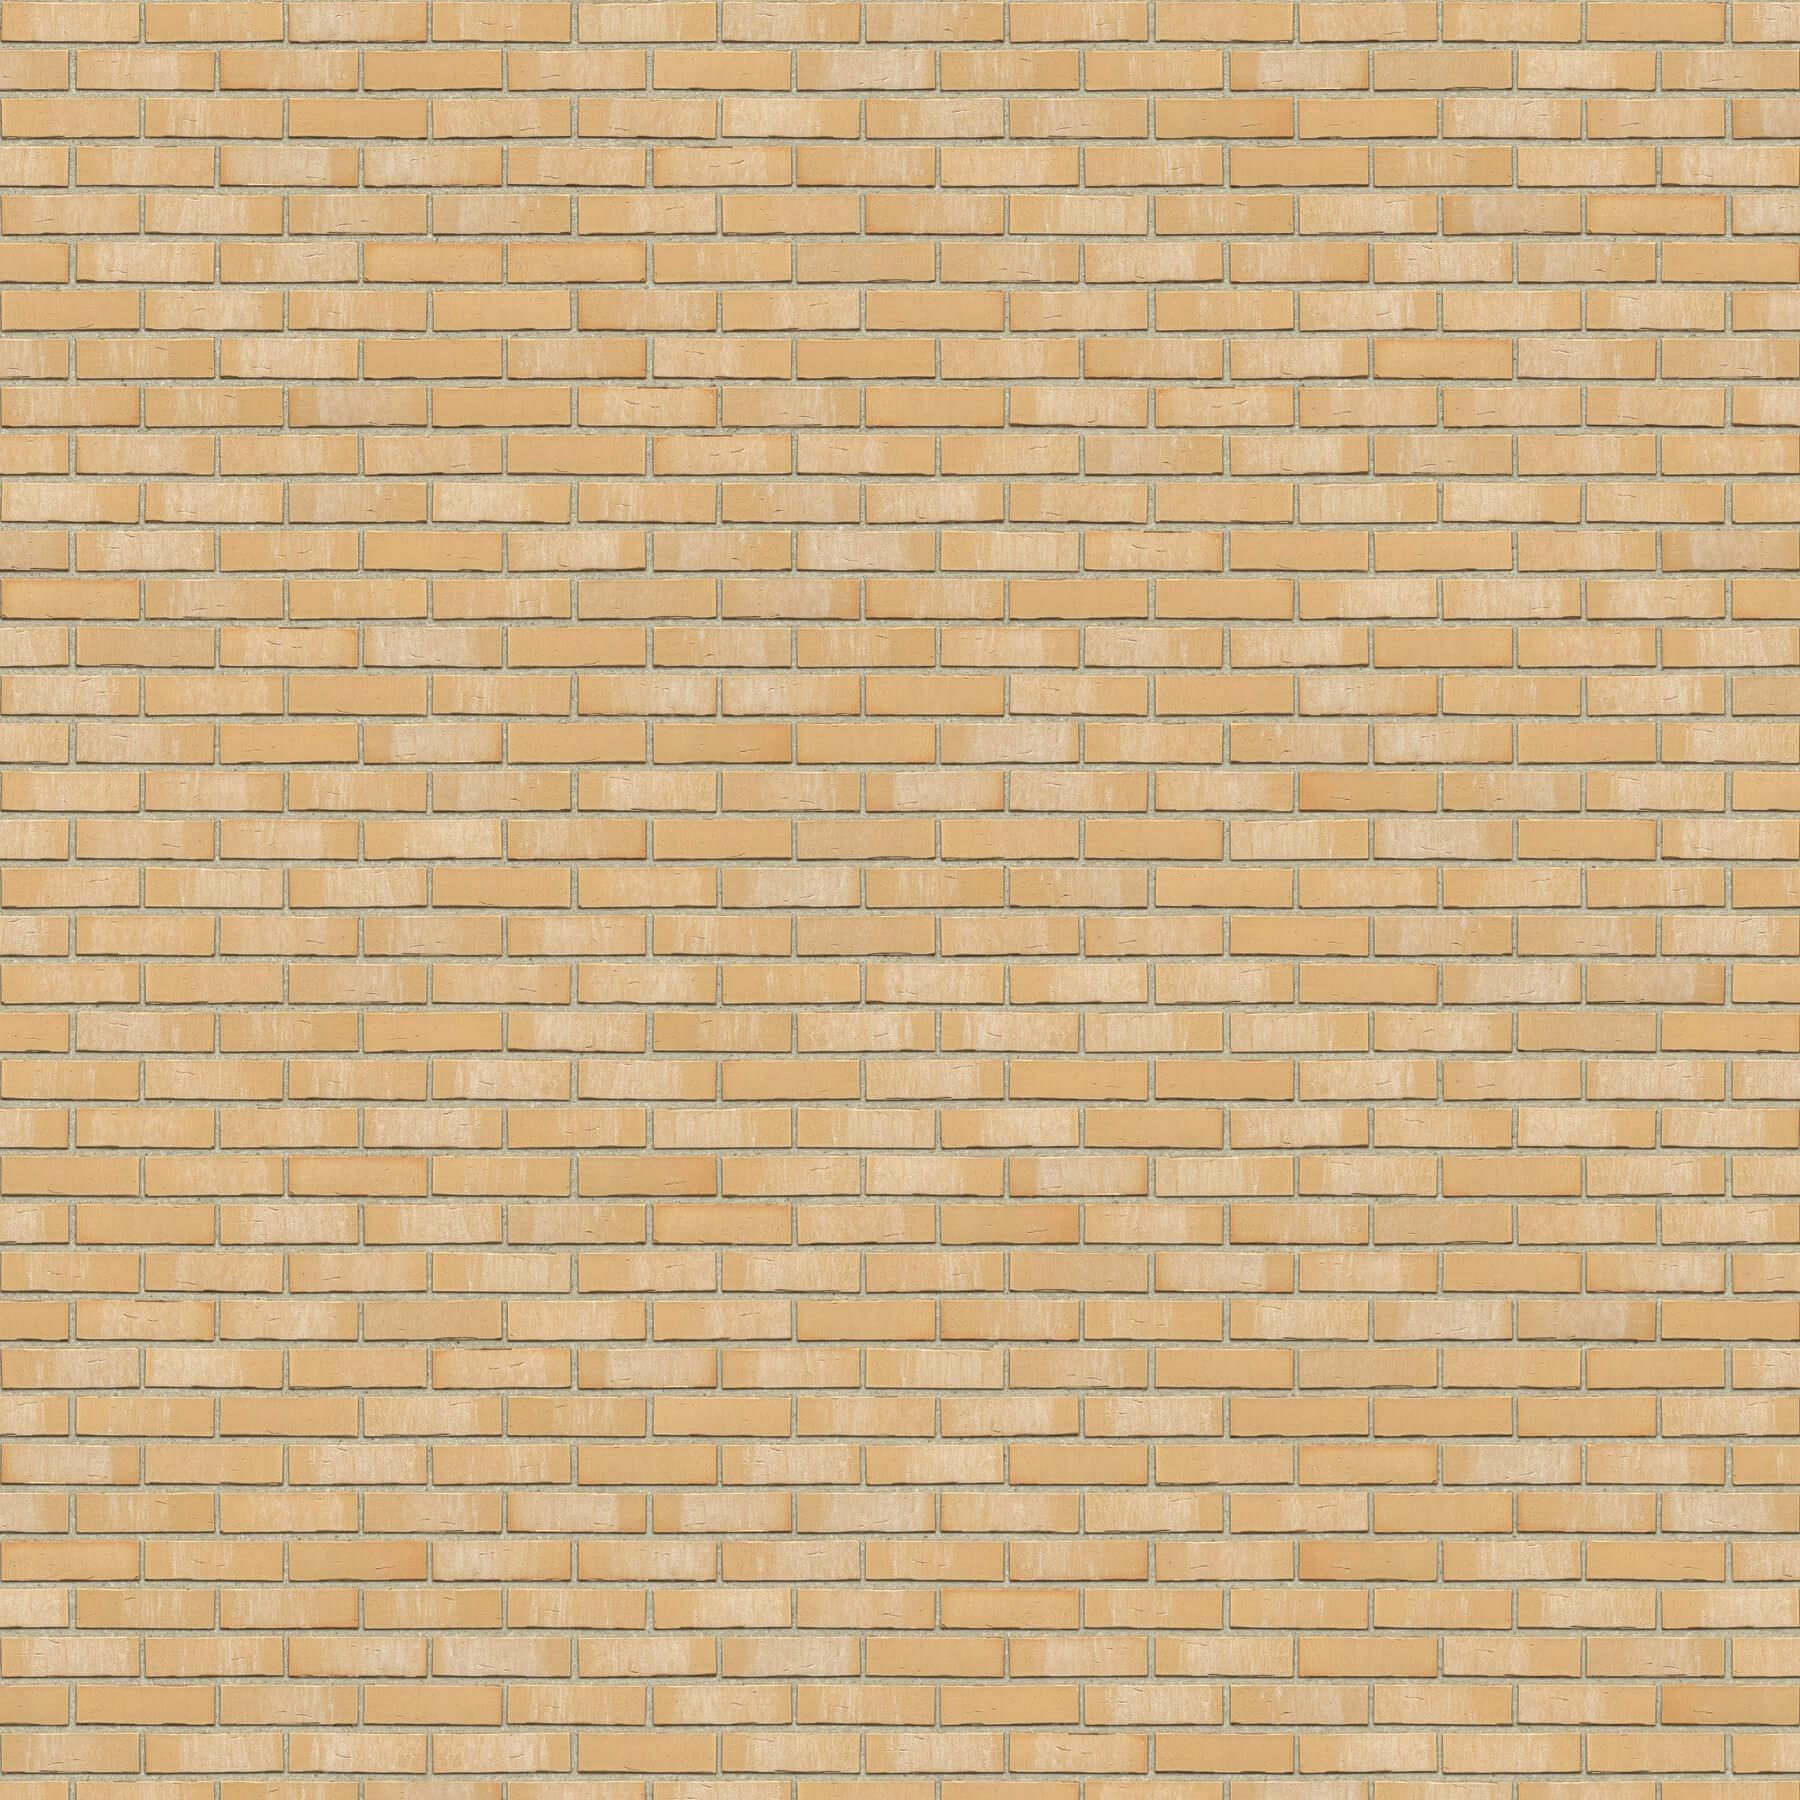 Dekorativna cigla listela FeldHaus Klinker r-756 nf Bez